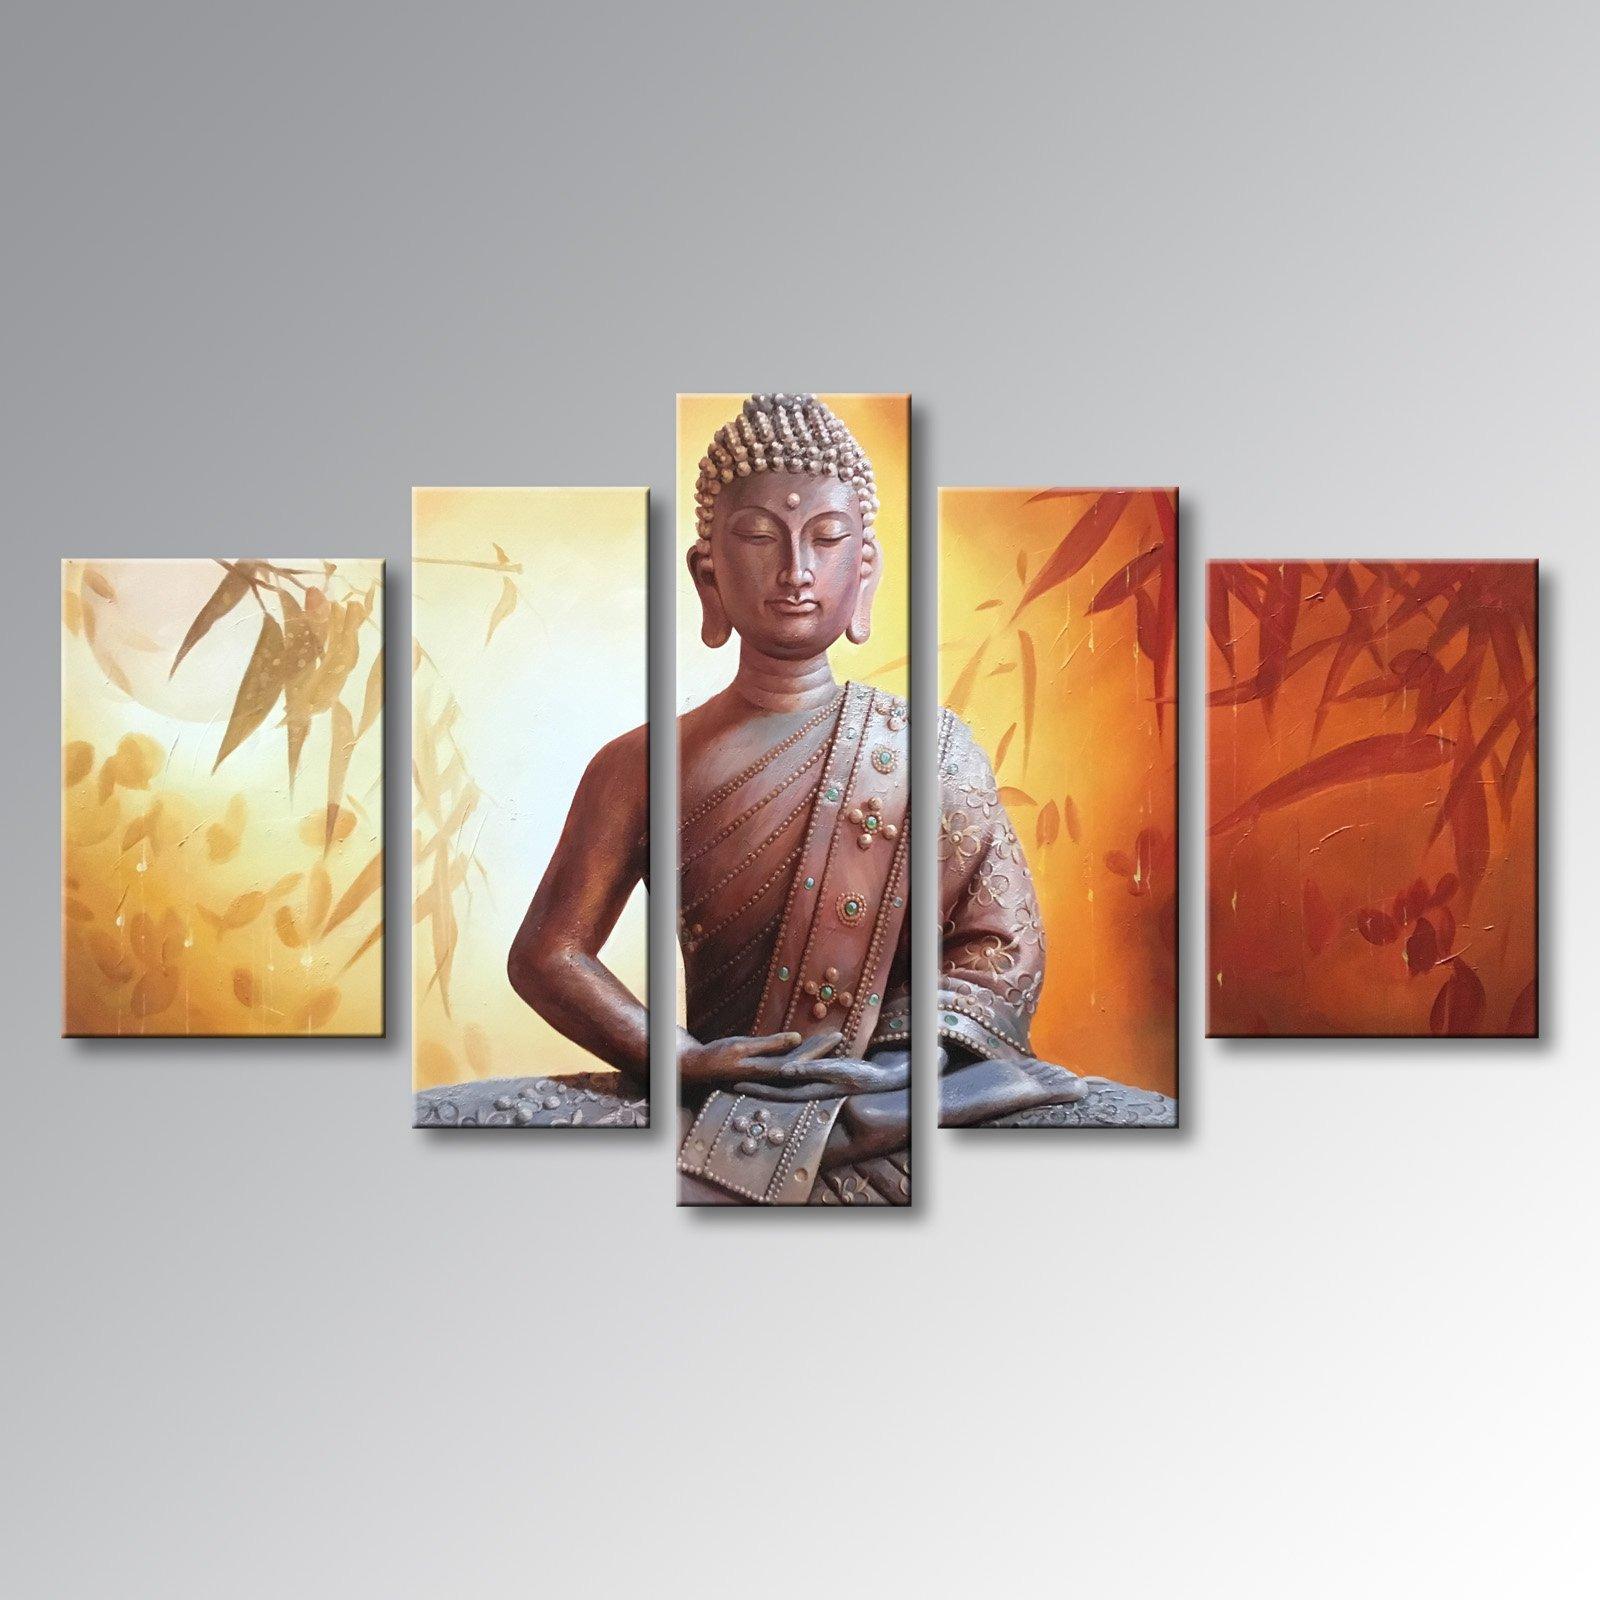 Winpeak Art Framed Handmade Buddha Wall Art on Canvas Abstract Oil Painting Modern Contemporary Decor Stretched Ready to Hang (58''W x 32''H (14''x20'' x2, 10''x28'' x2, 10''x32'' x1))